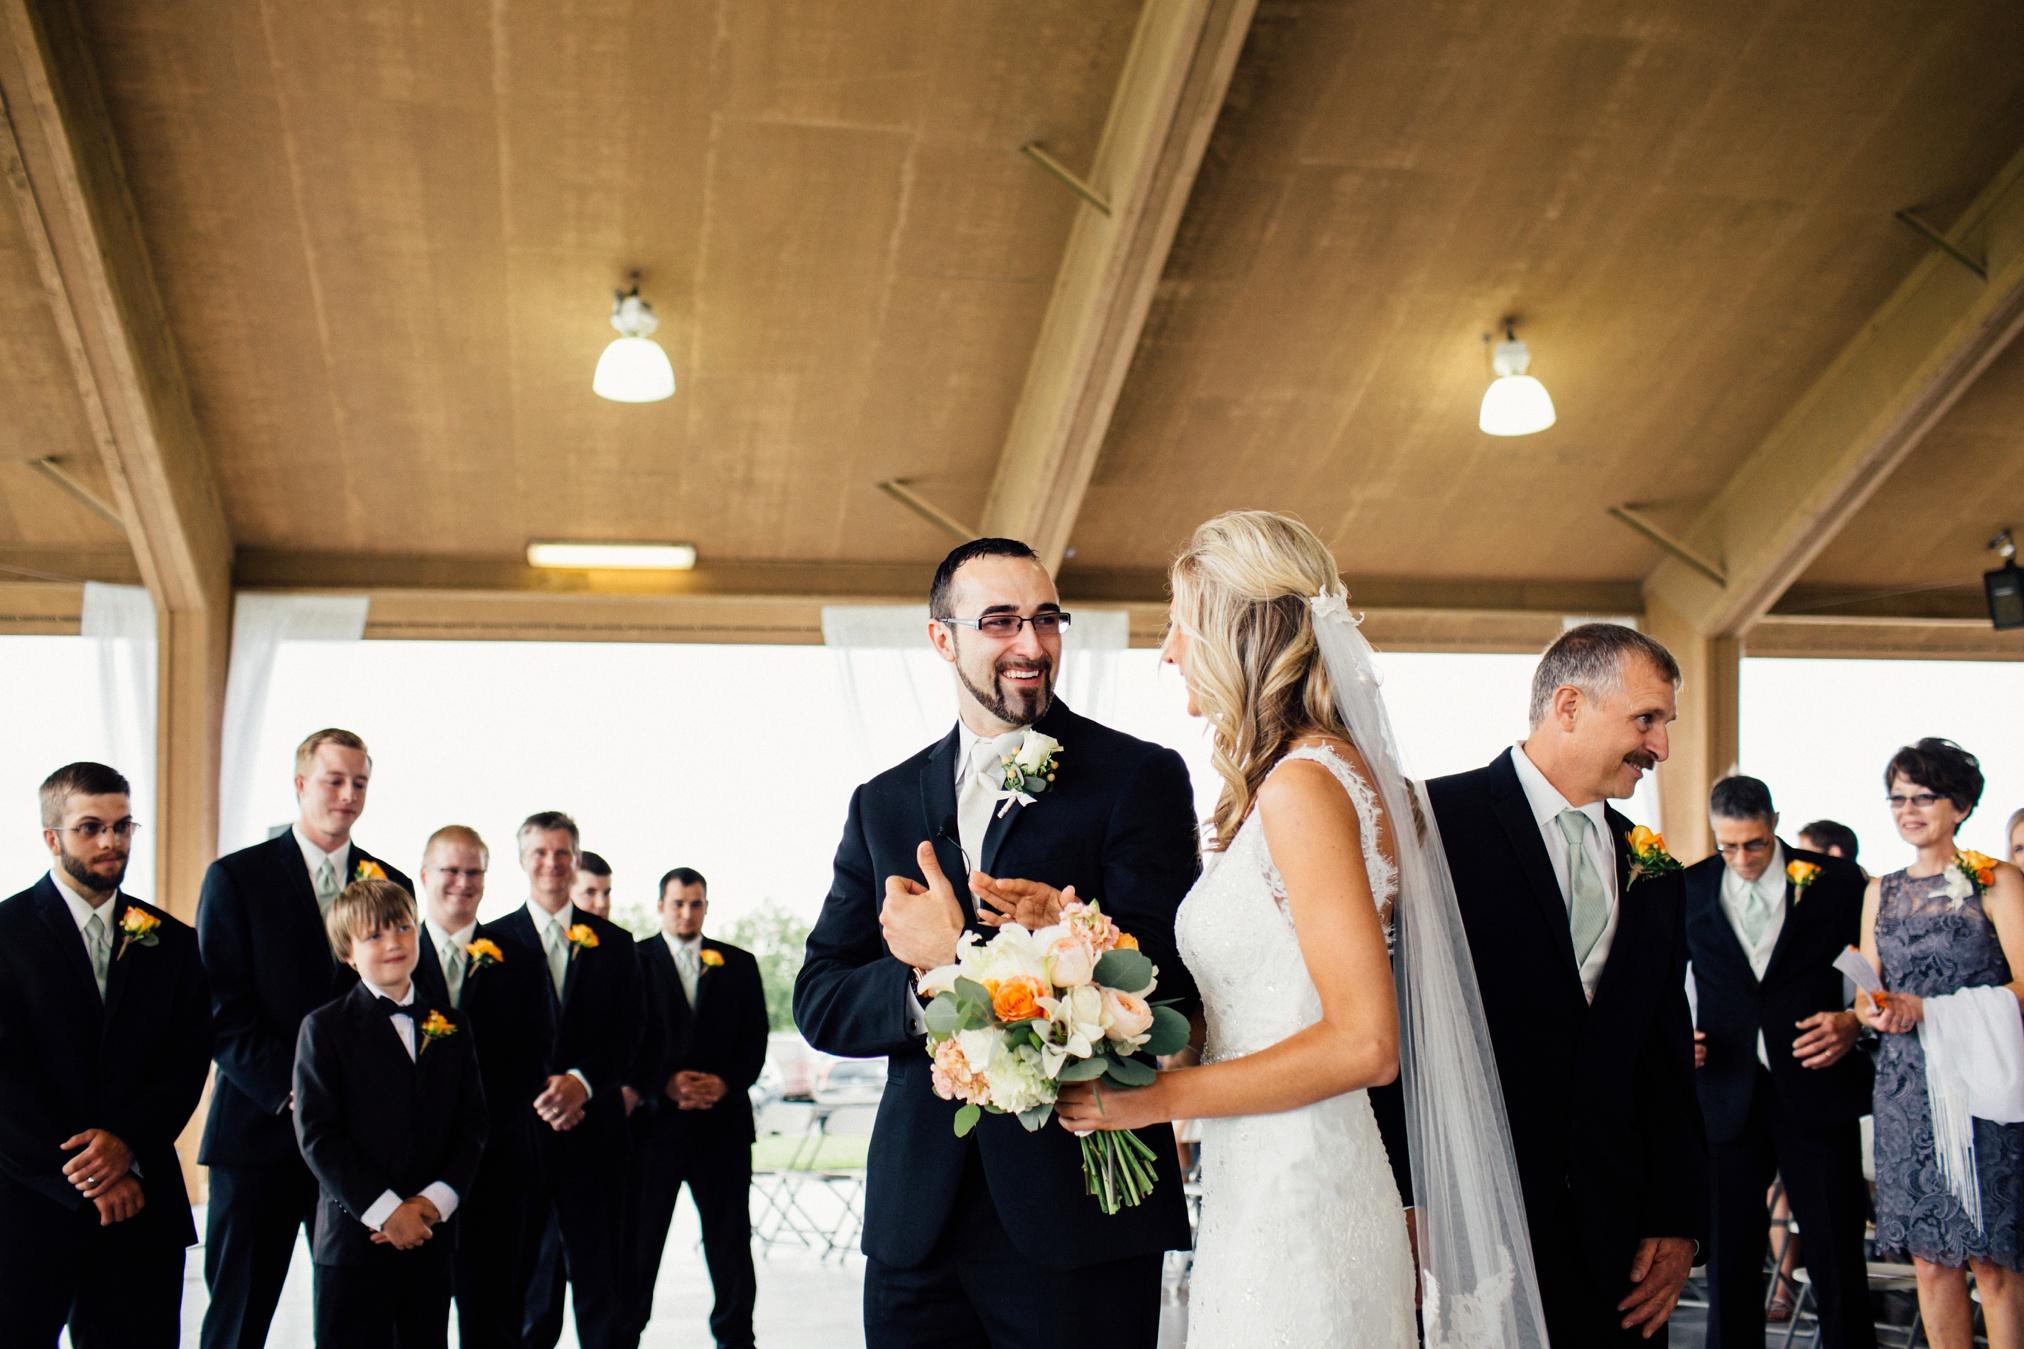 schmid_wedding-402.jpg